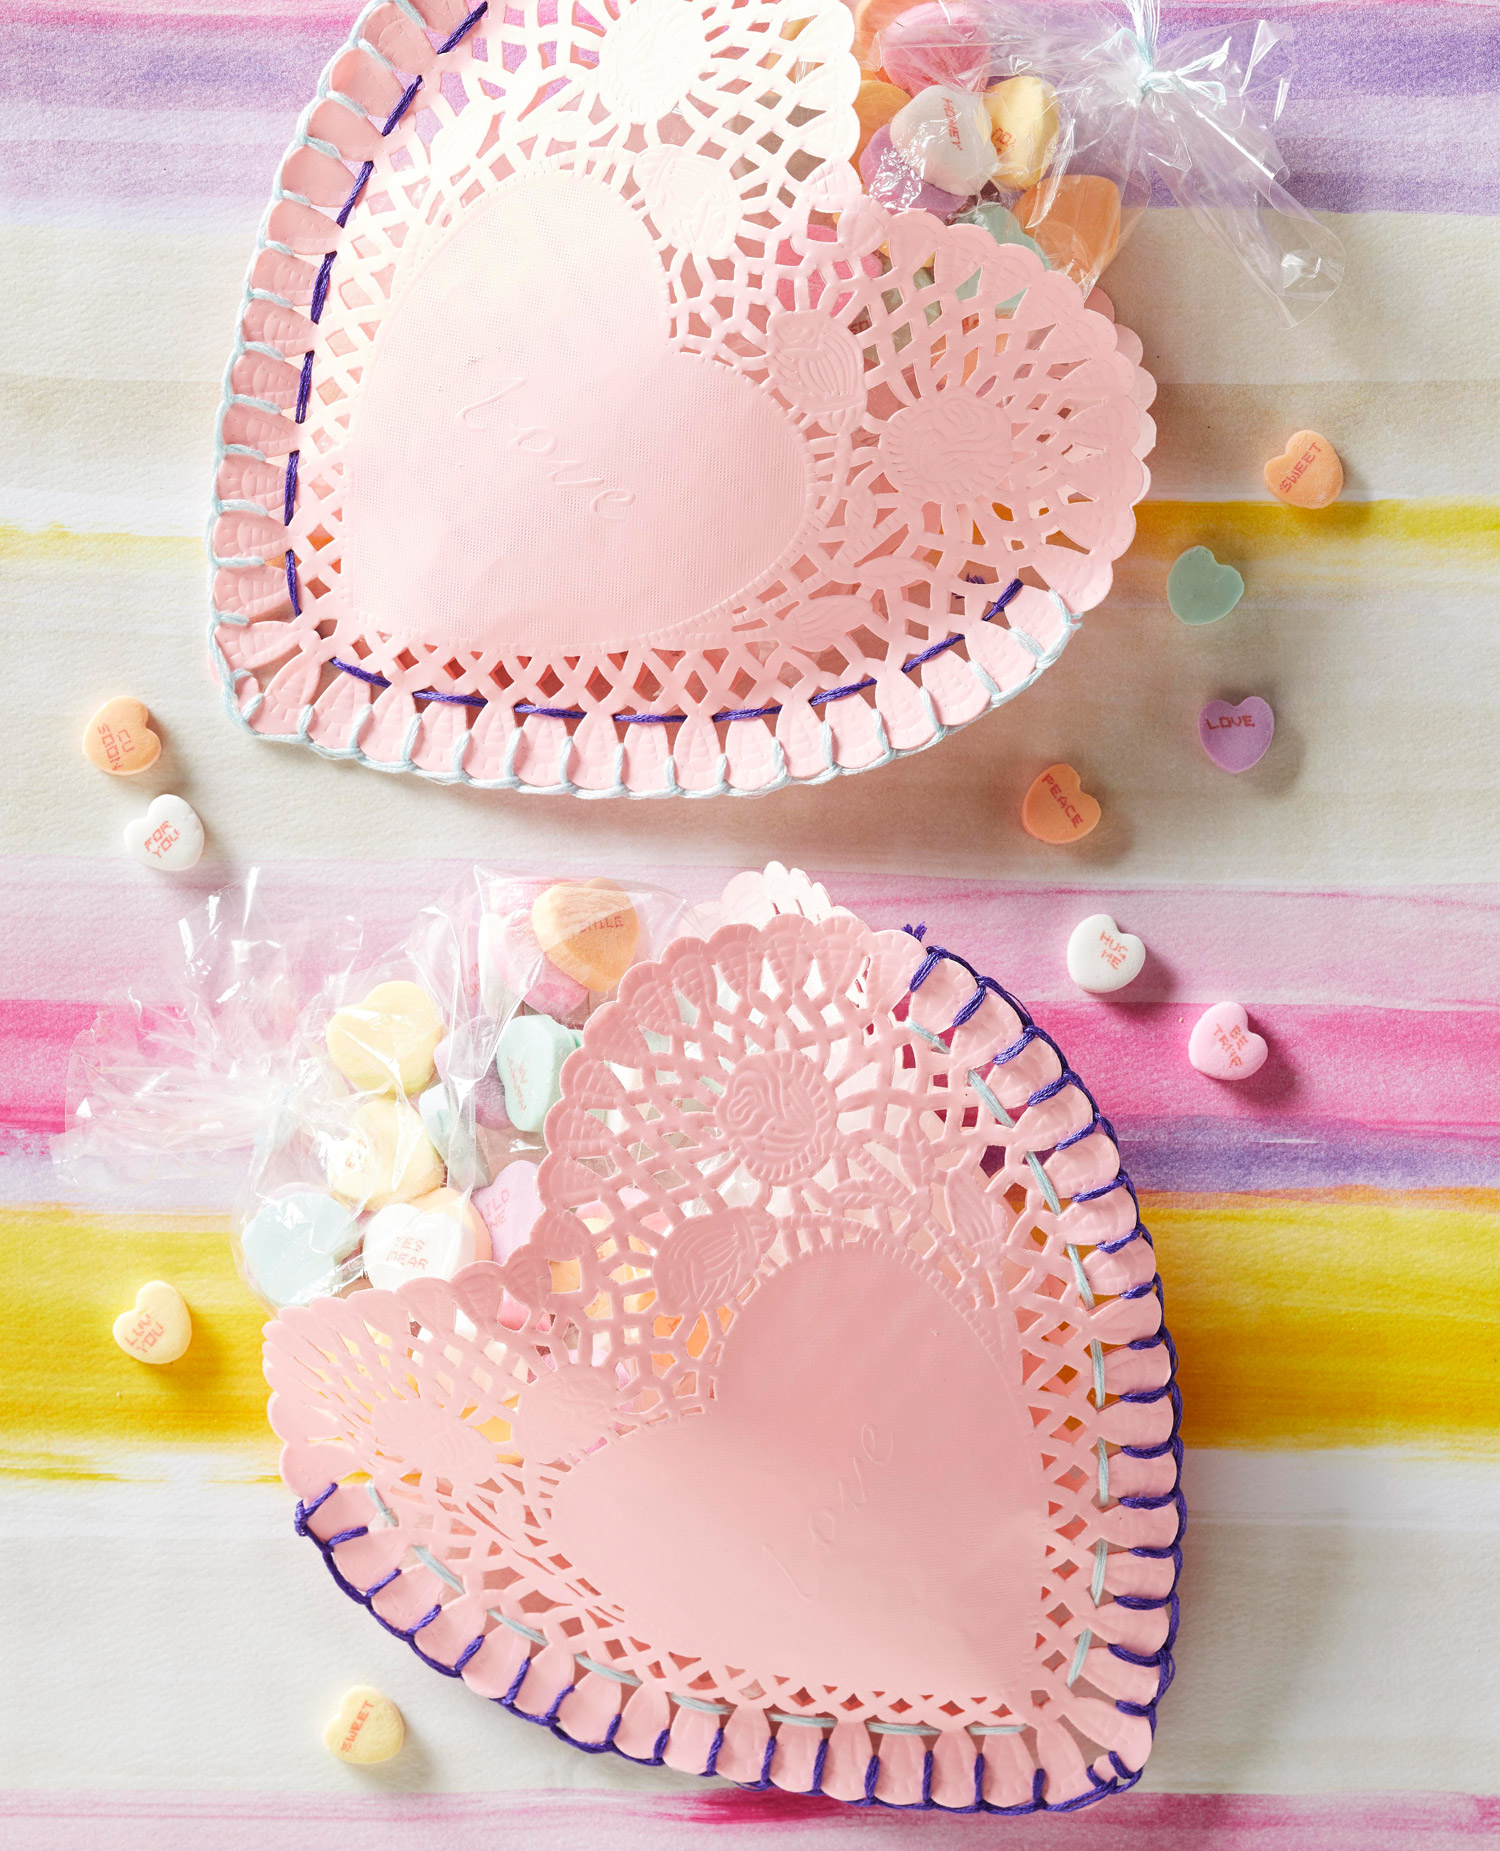 Valentine's Day doily craft